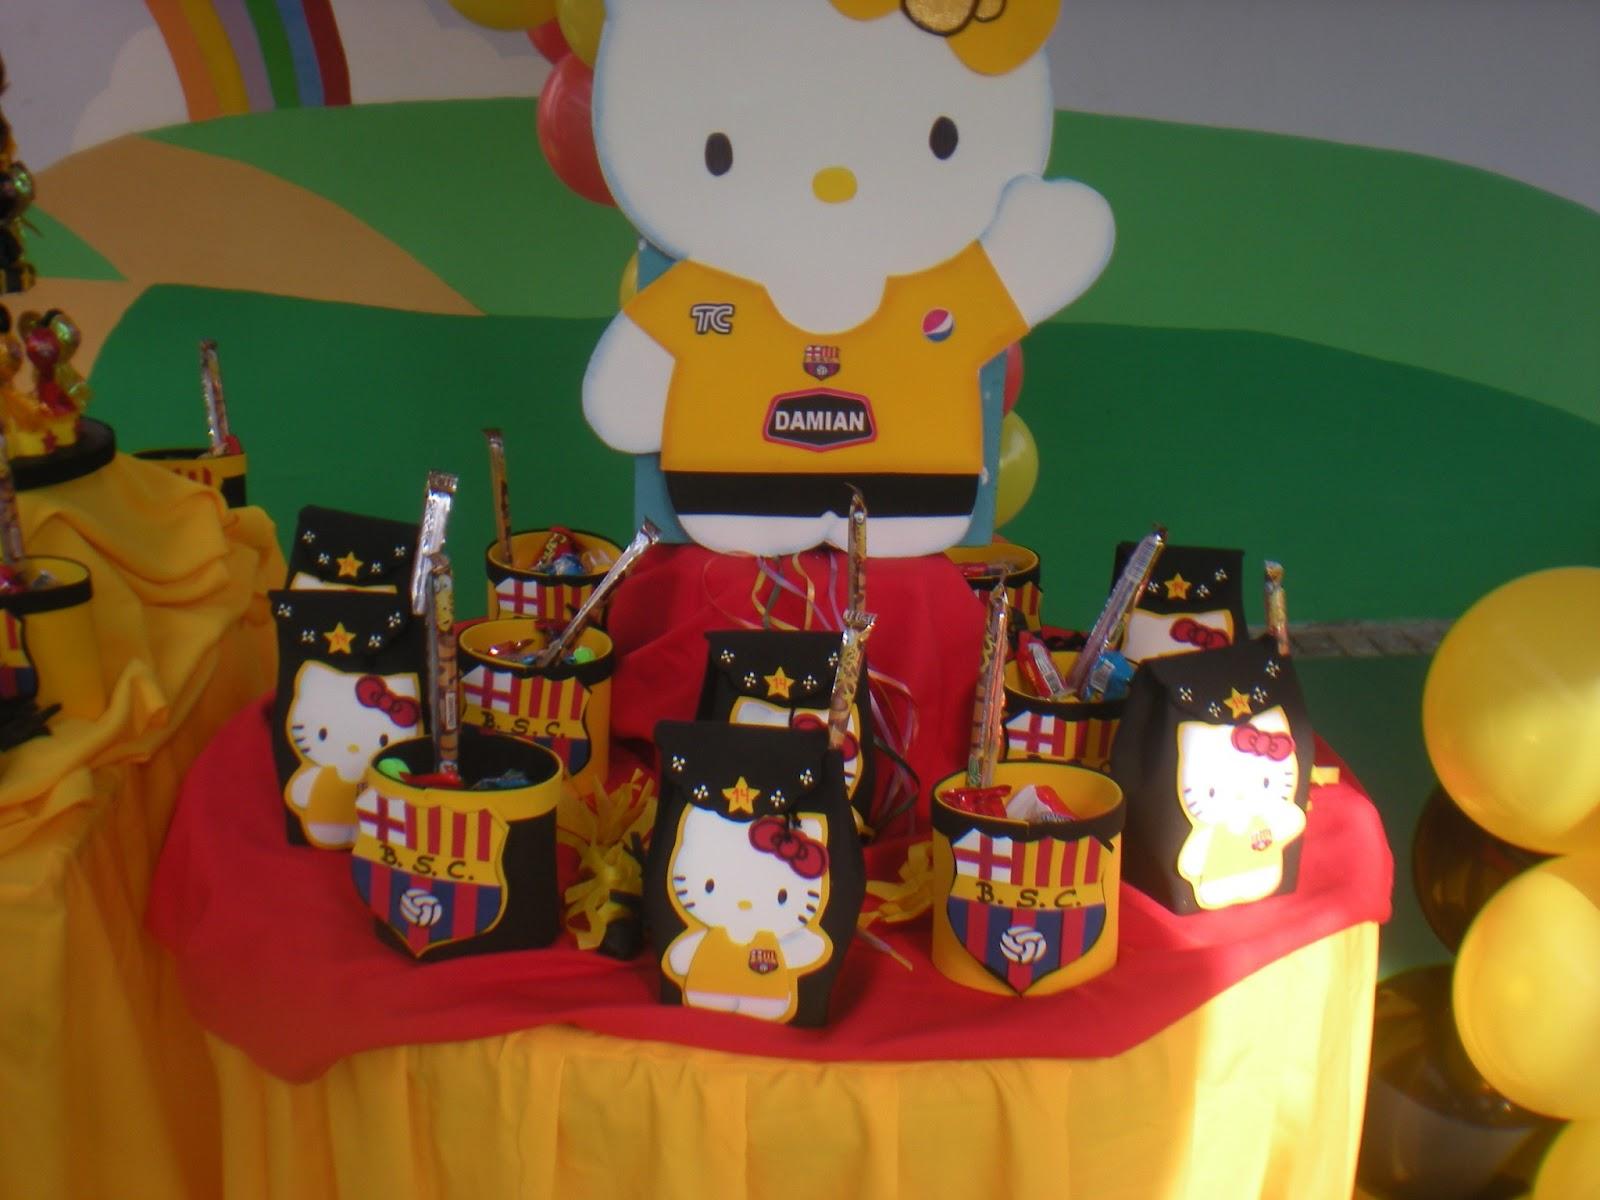 Mi dulce sorpresa sorpresas barcelona - Lucio barcelona decoracion ...